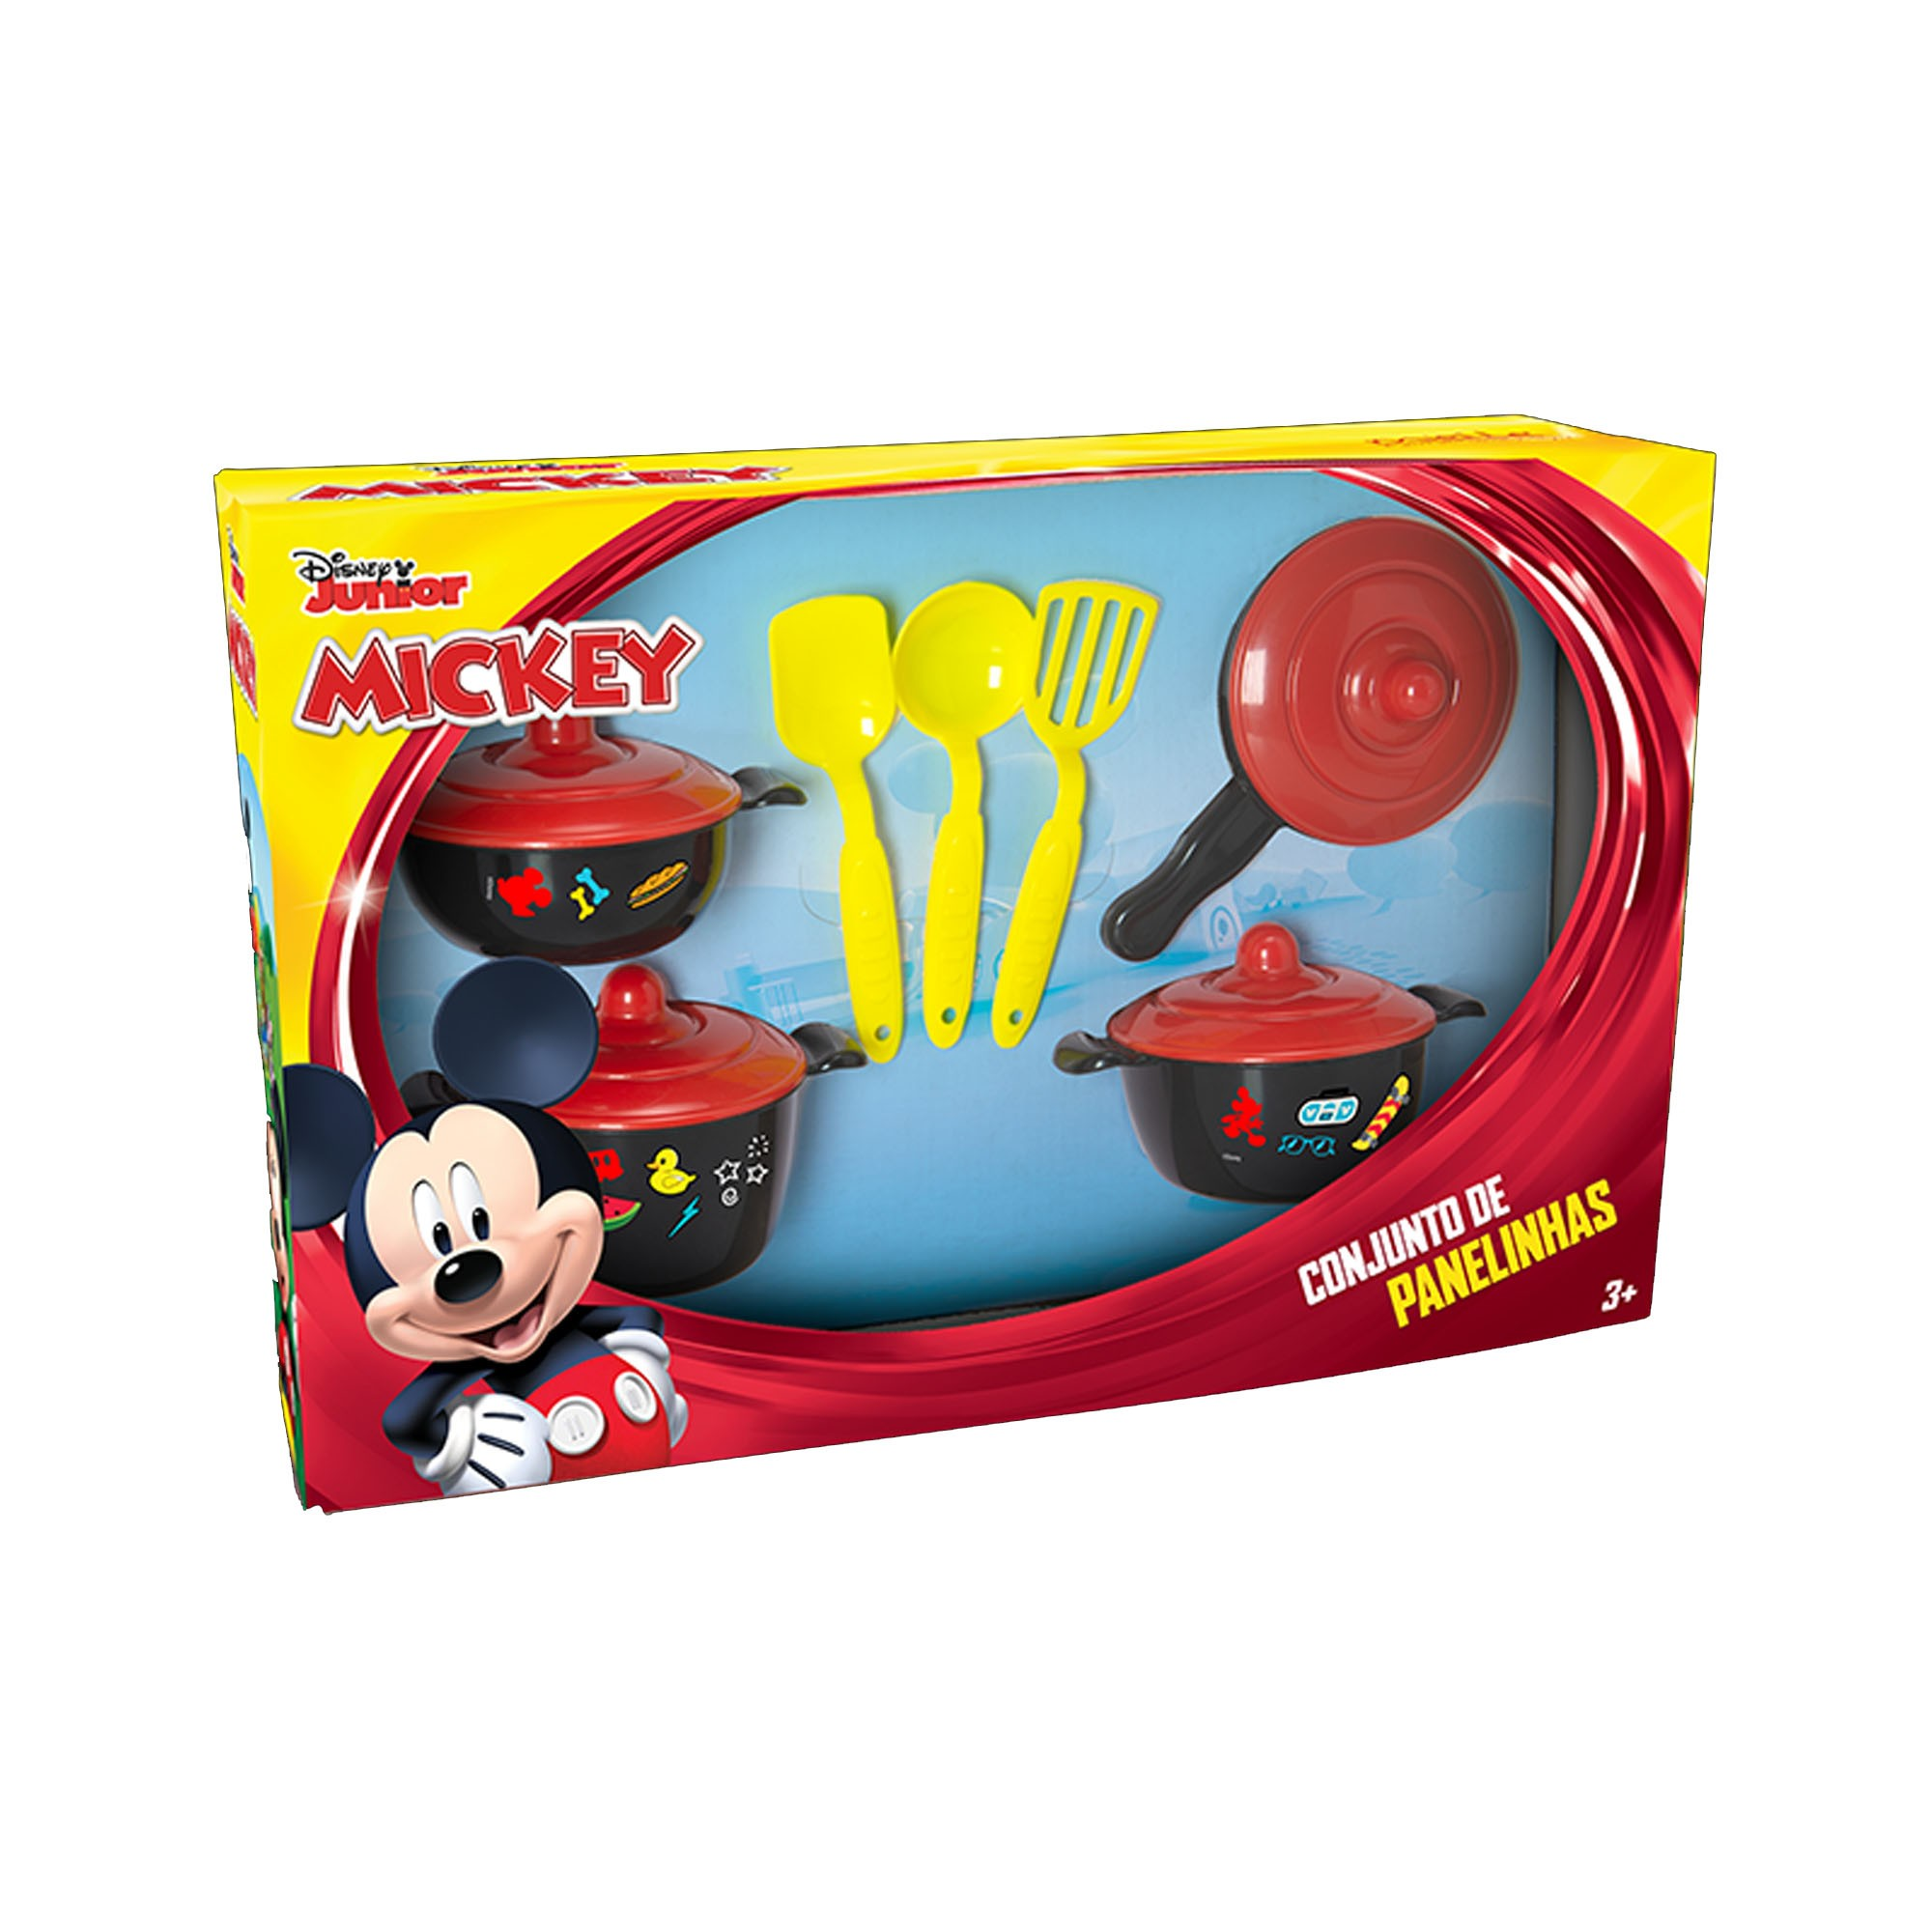 Kit Cozinha Infantil Panelinhas Talheres Mickey Disney - Mielle